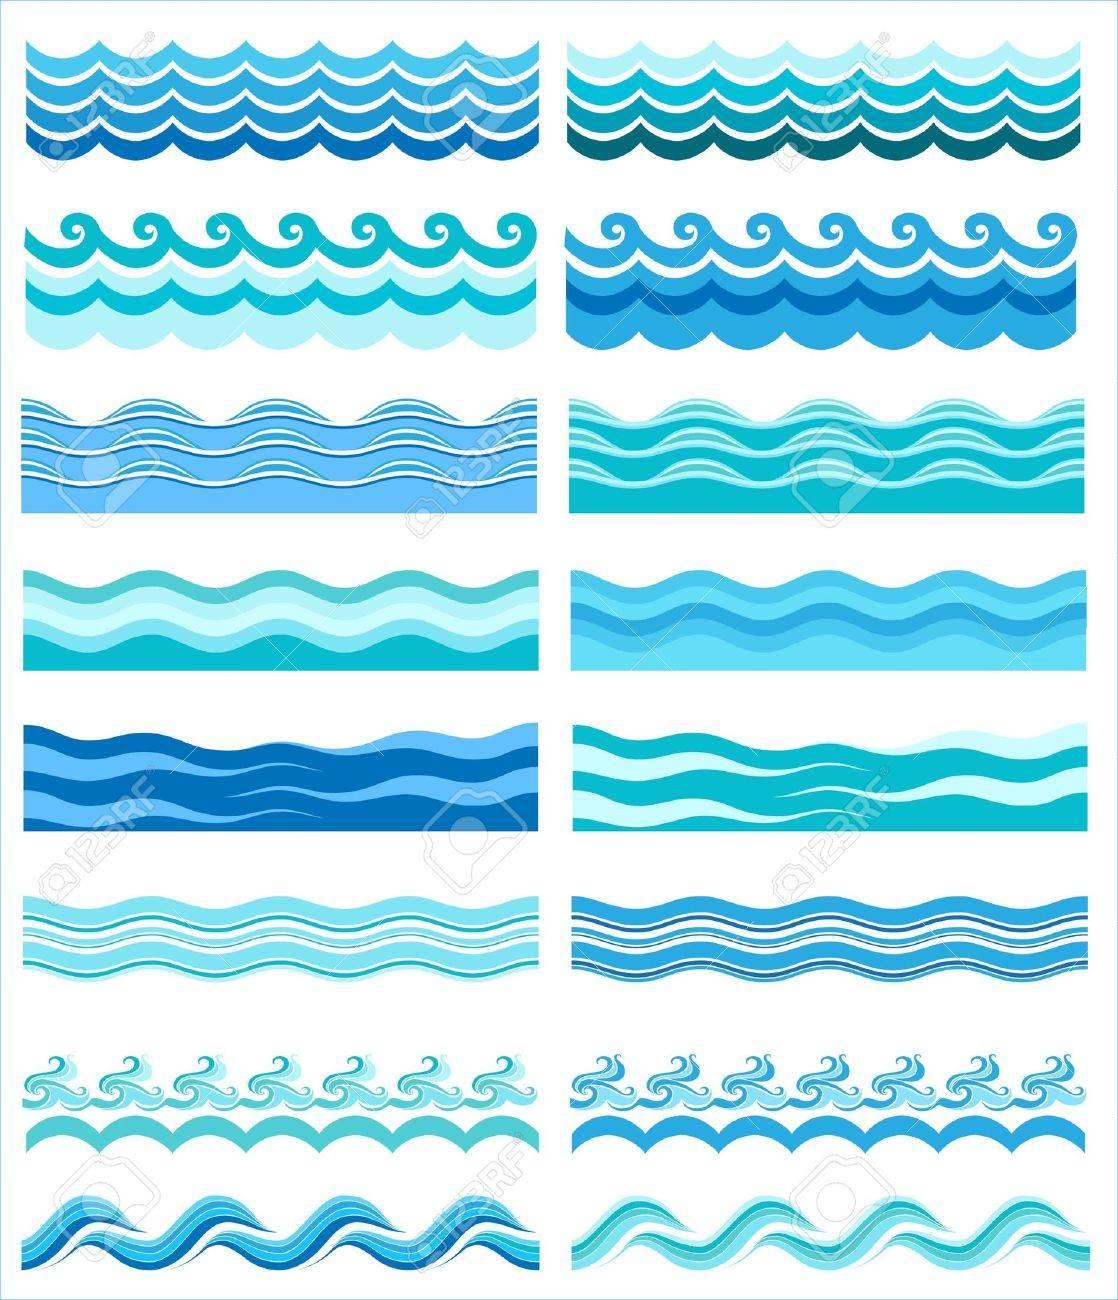 Seamless wave patterns - 11251763